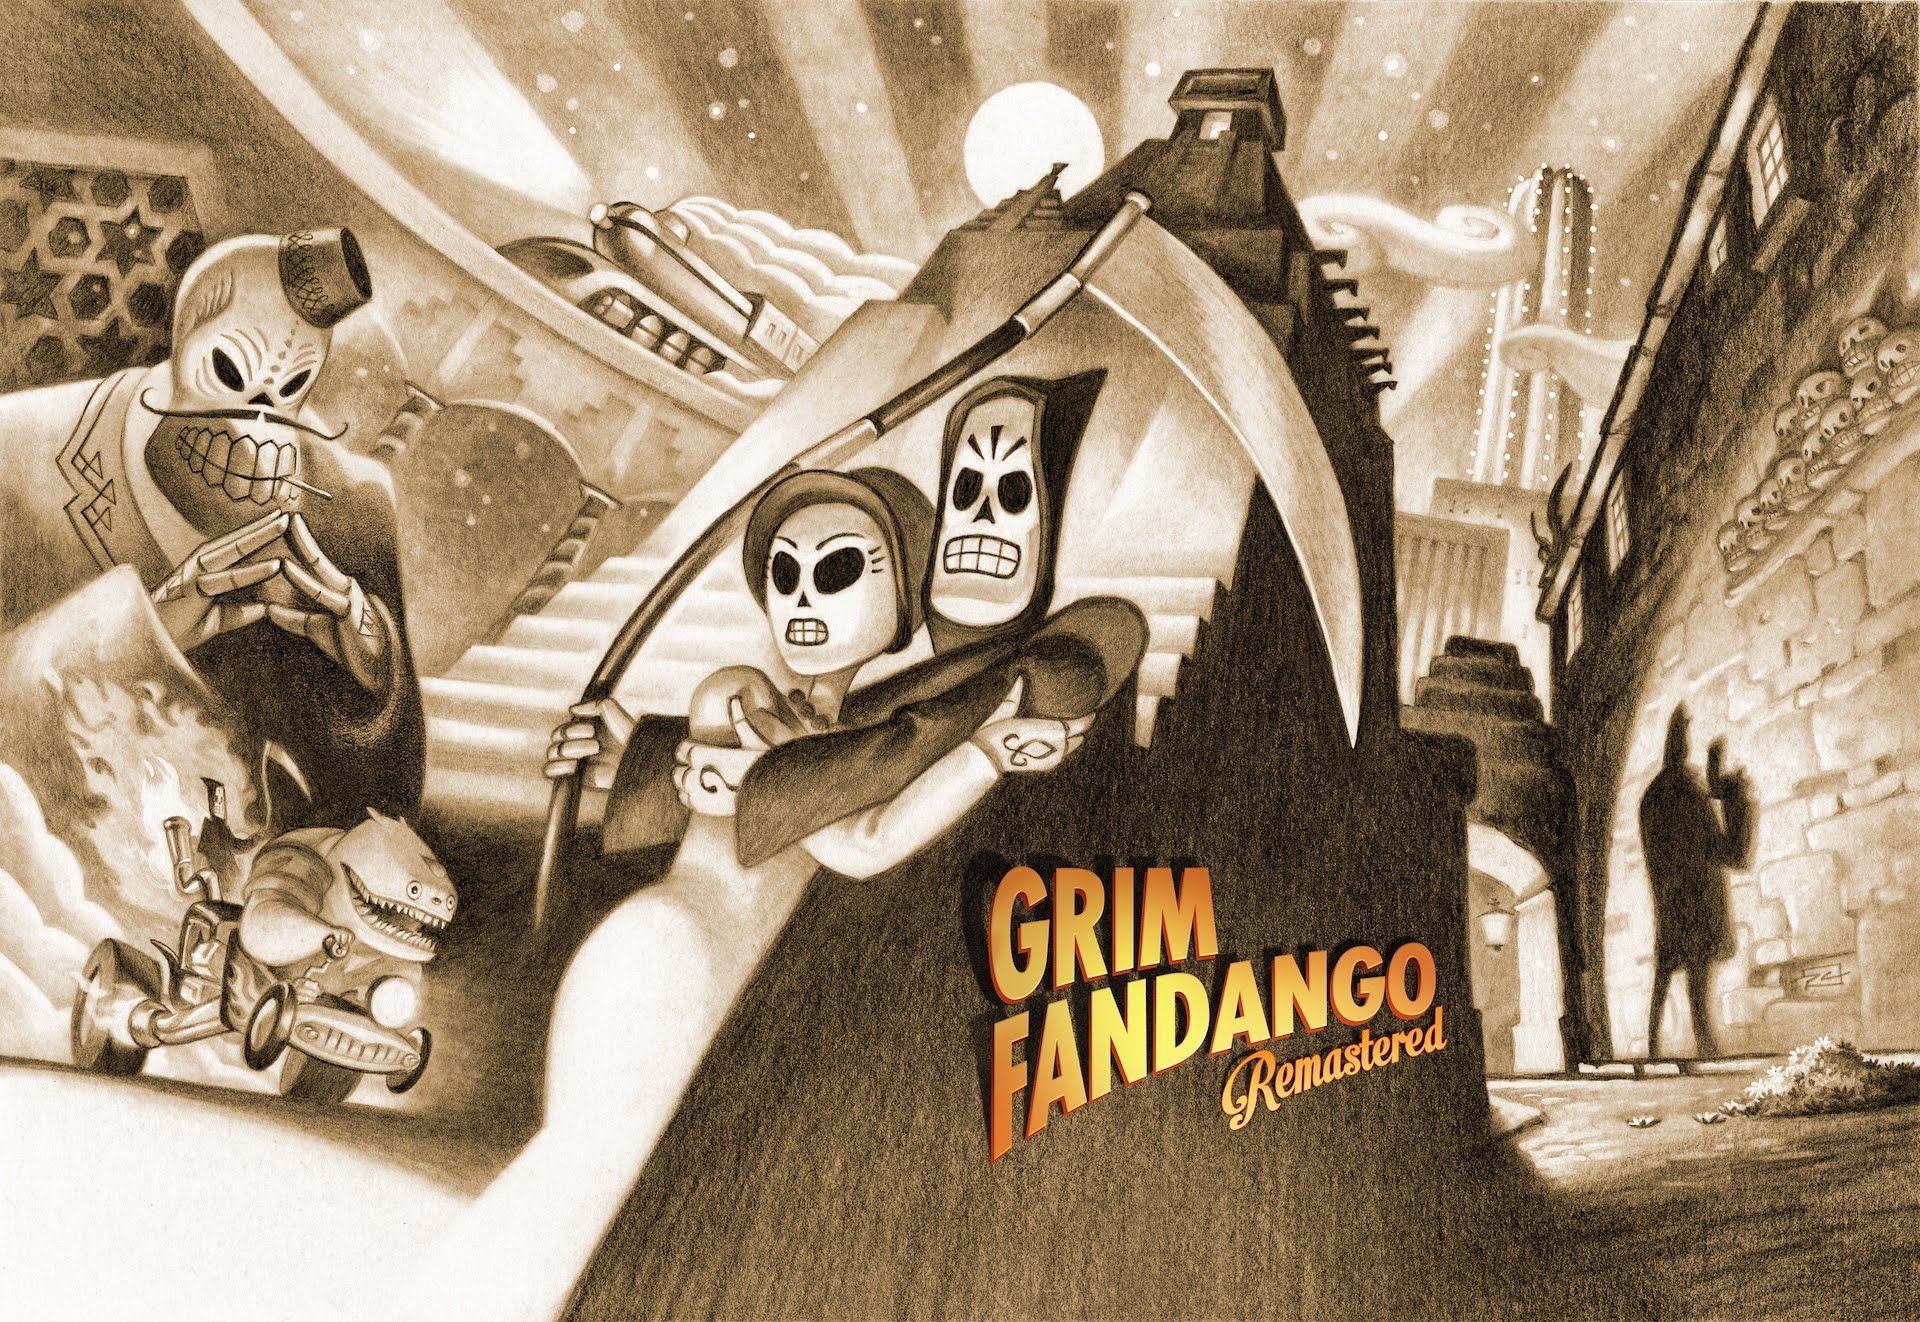 Grim Fandango Remastered Free Download PC Game Retro